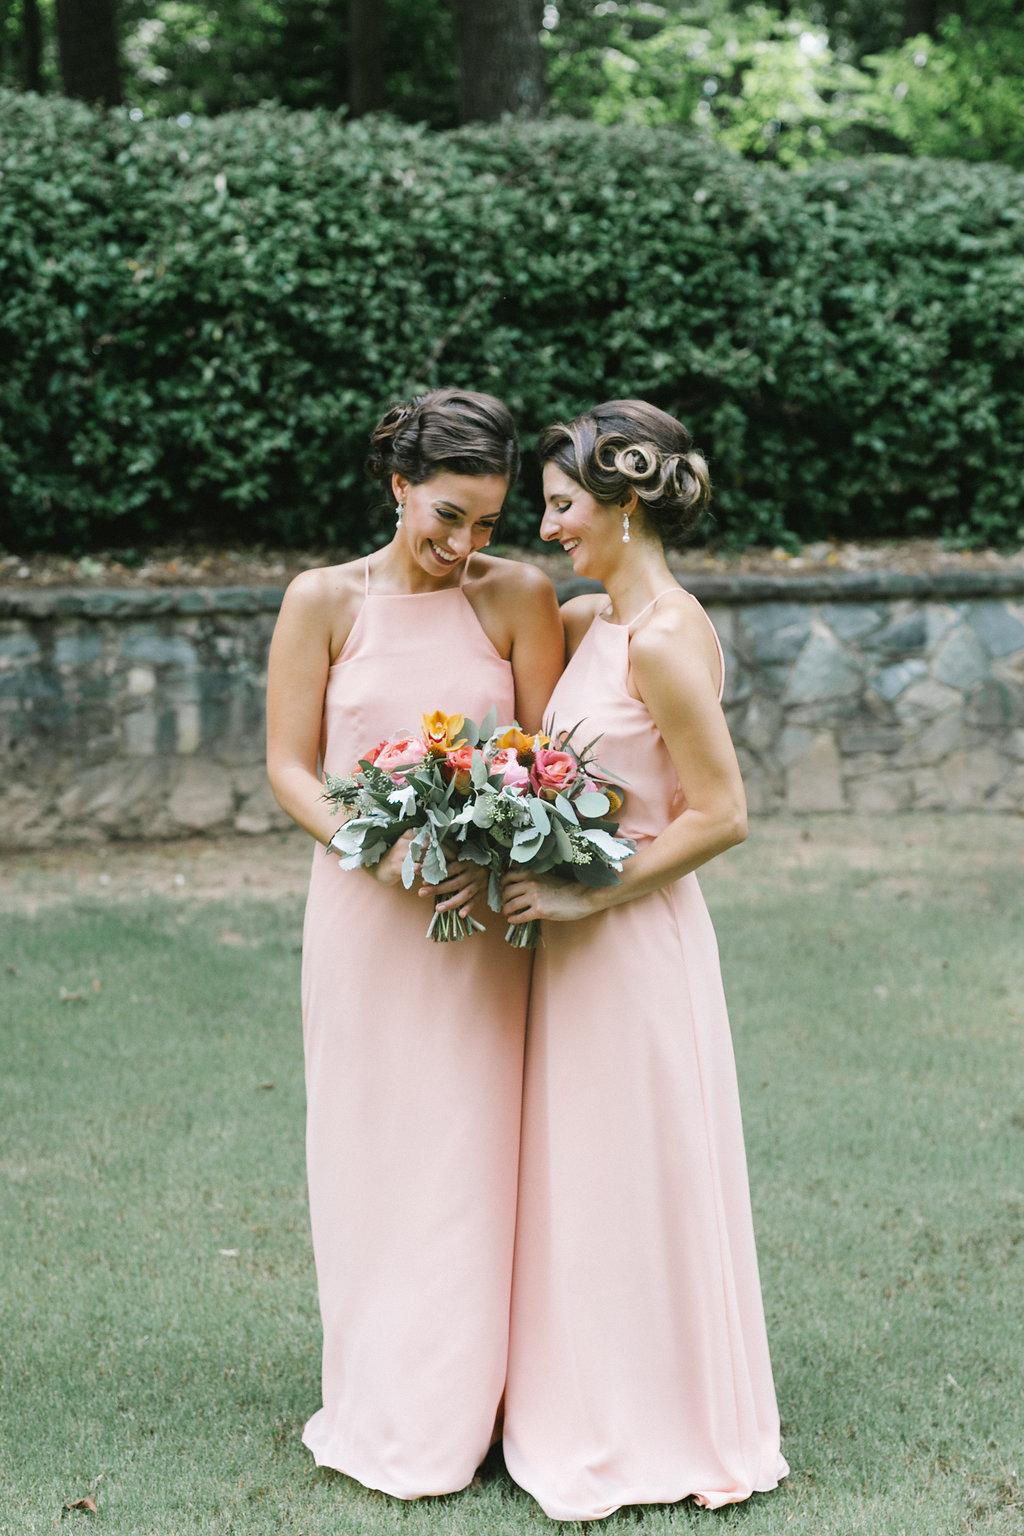 light peach bridesmaid dresses - http://ruffledblog.com/vibrant-atlanta-wedding-inspiration-with-rust-accents